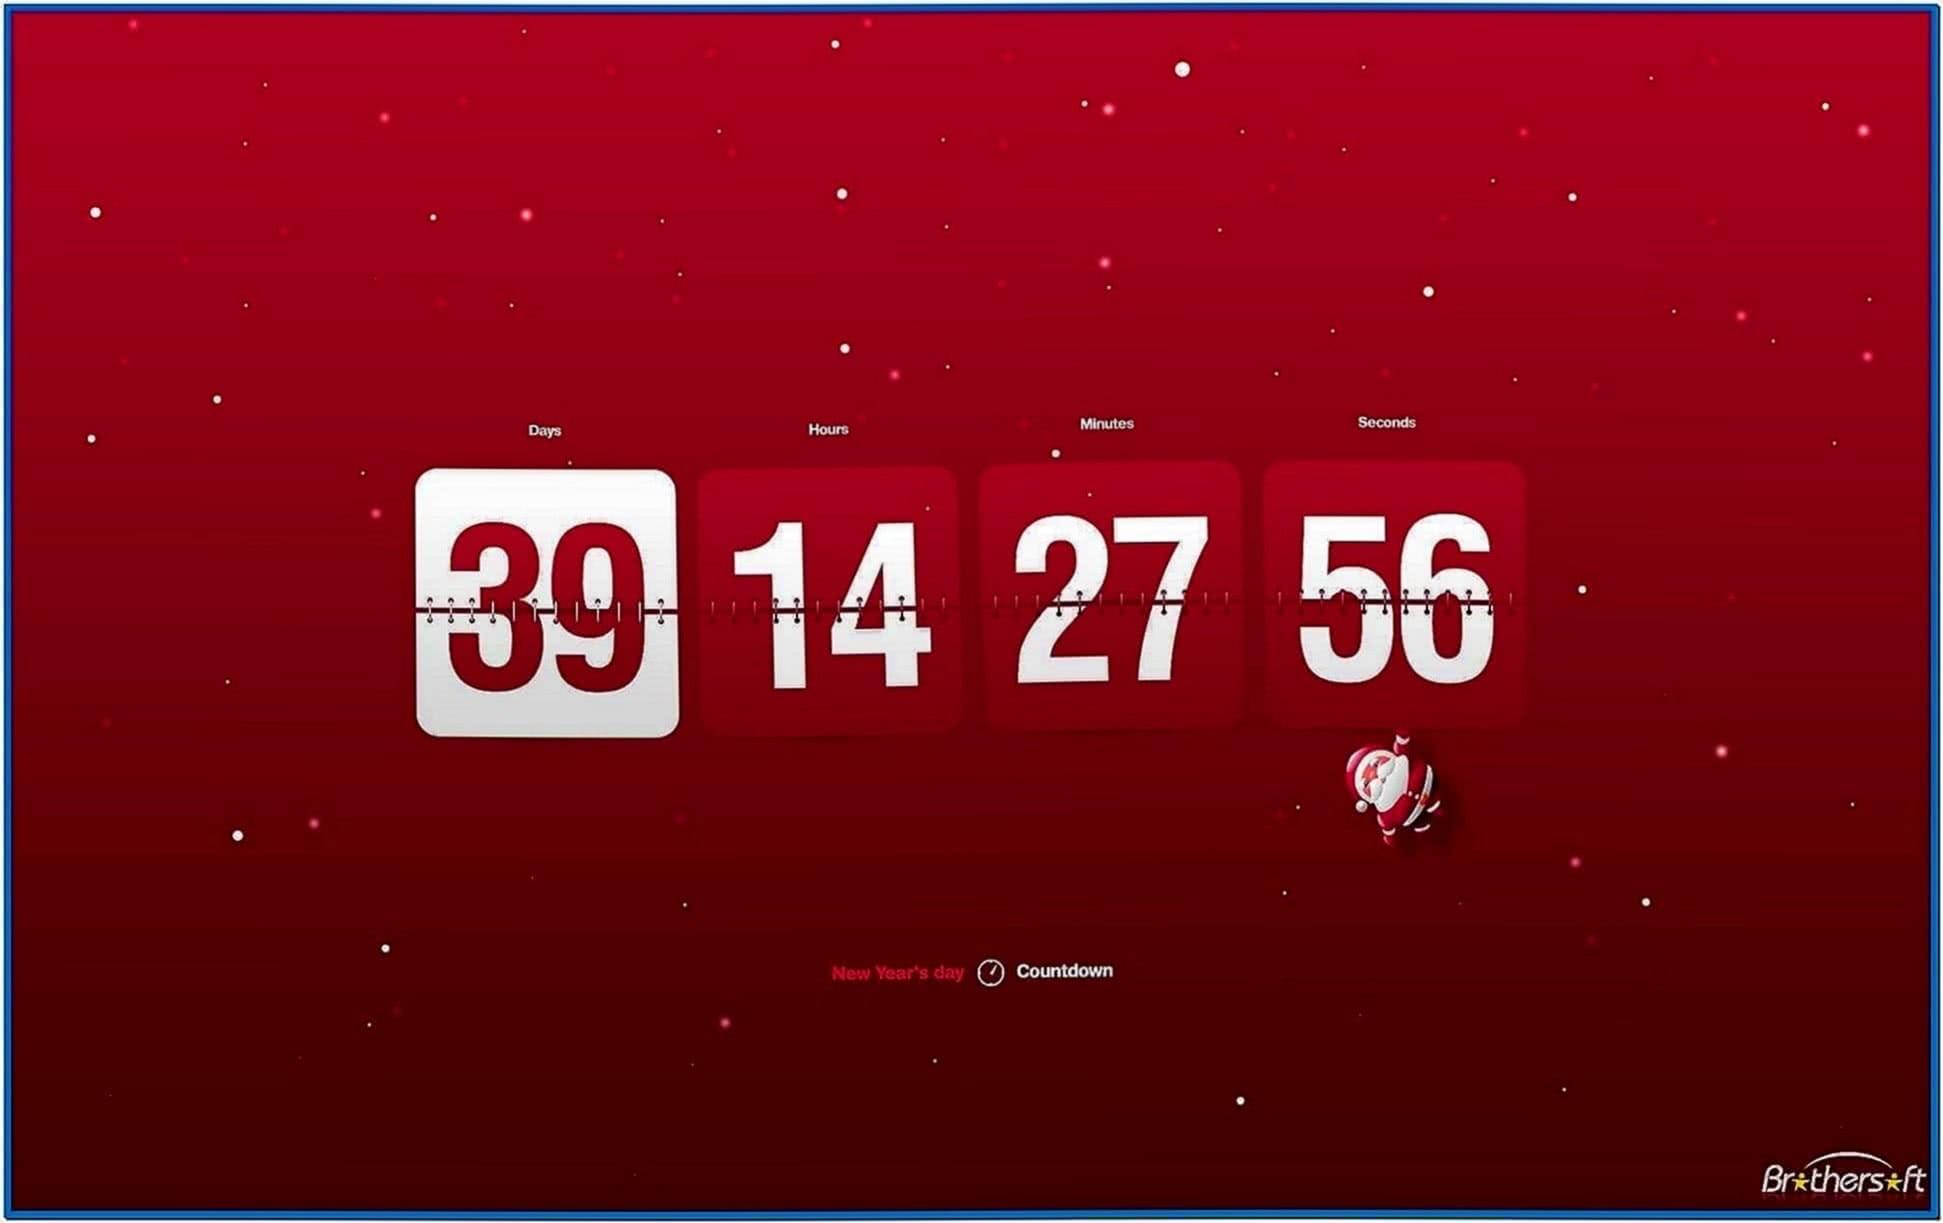 xmas clock countdown